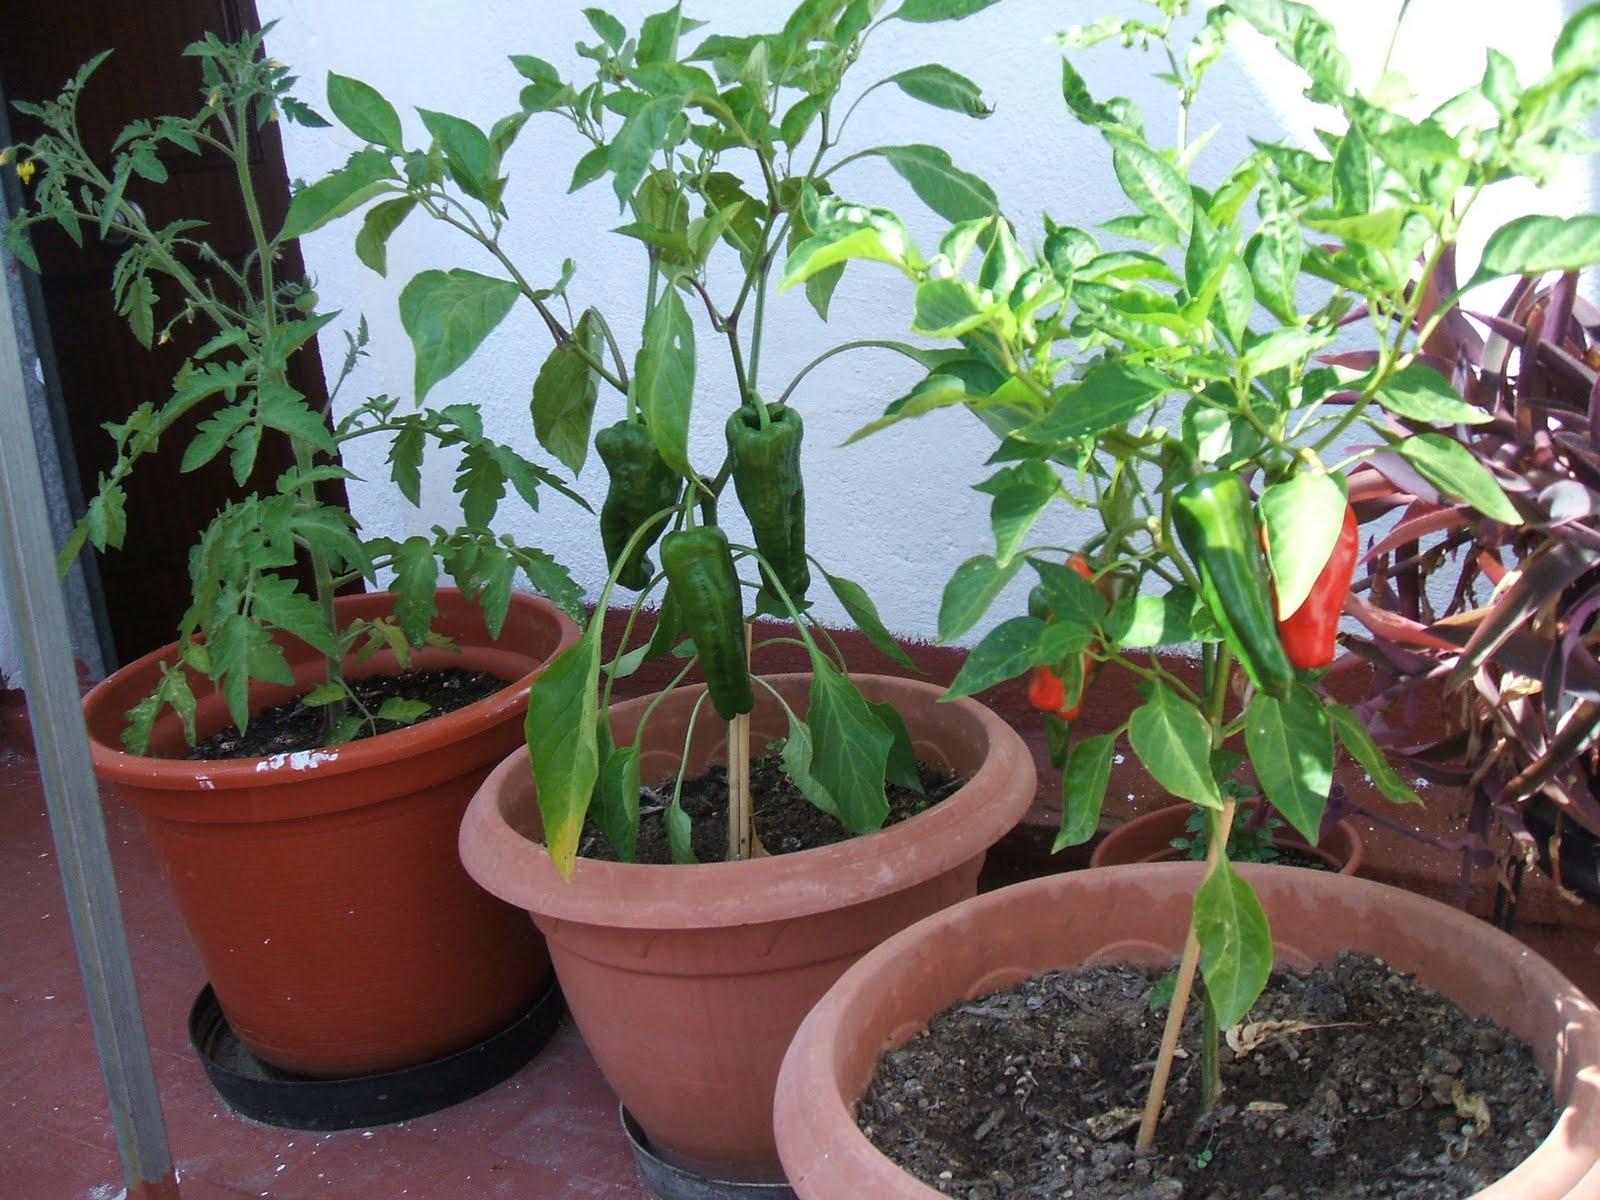 Naturalmente la huerta for Cultivo de arboles frutales en macetas